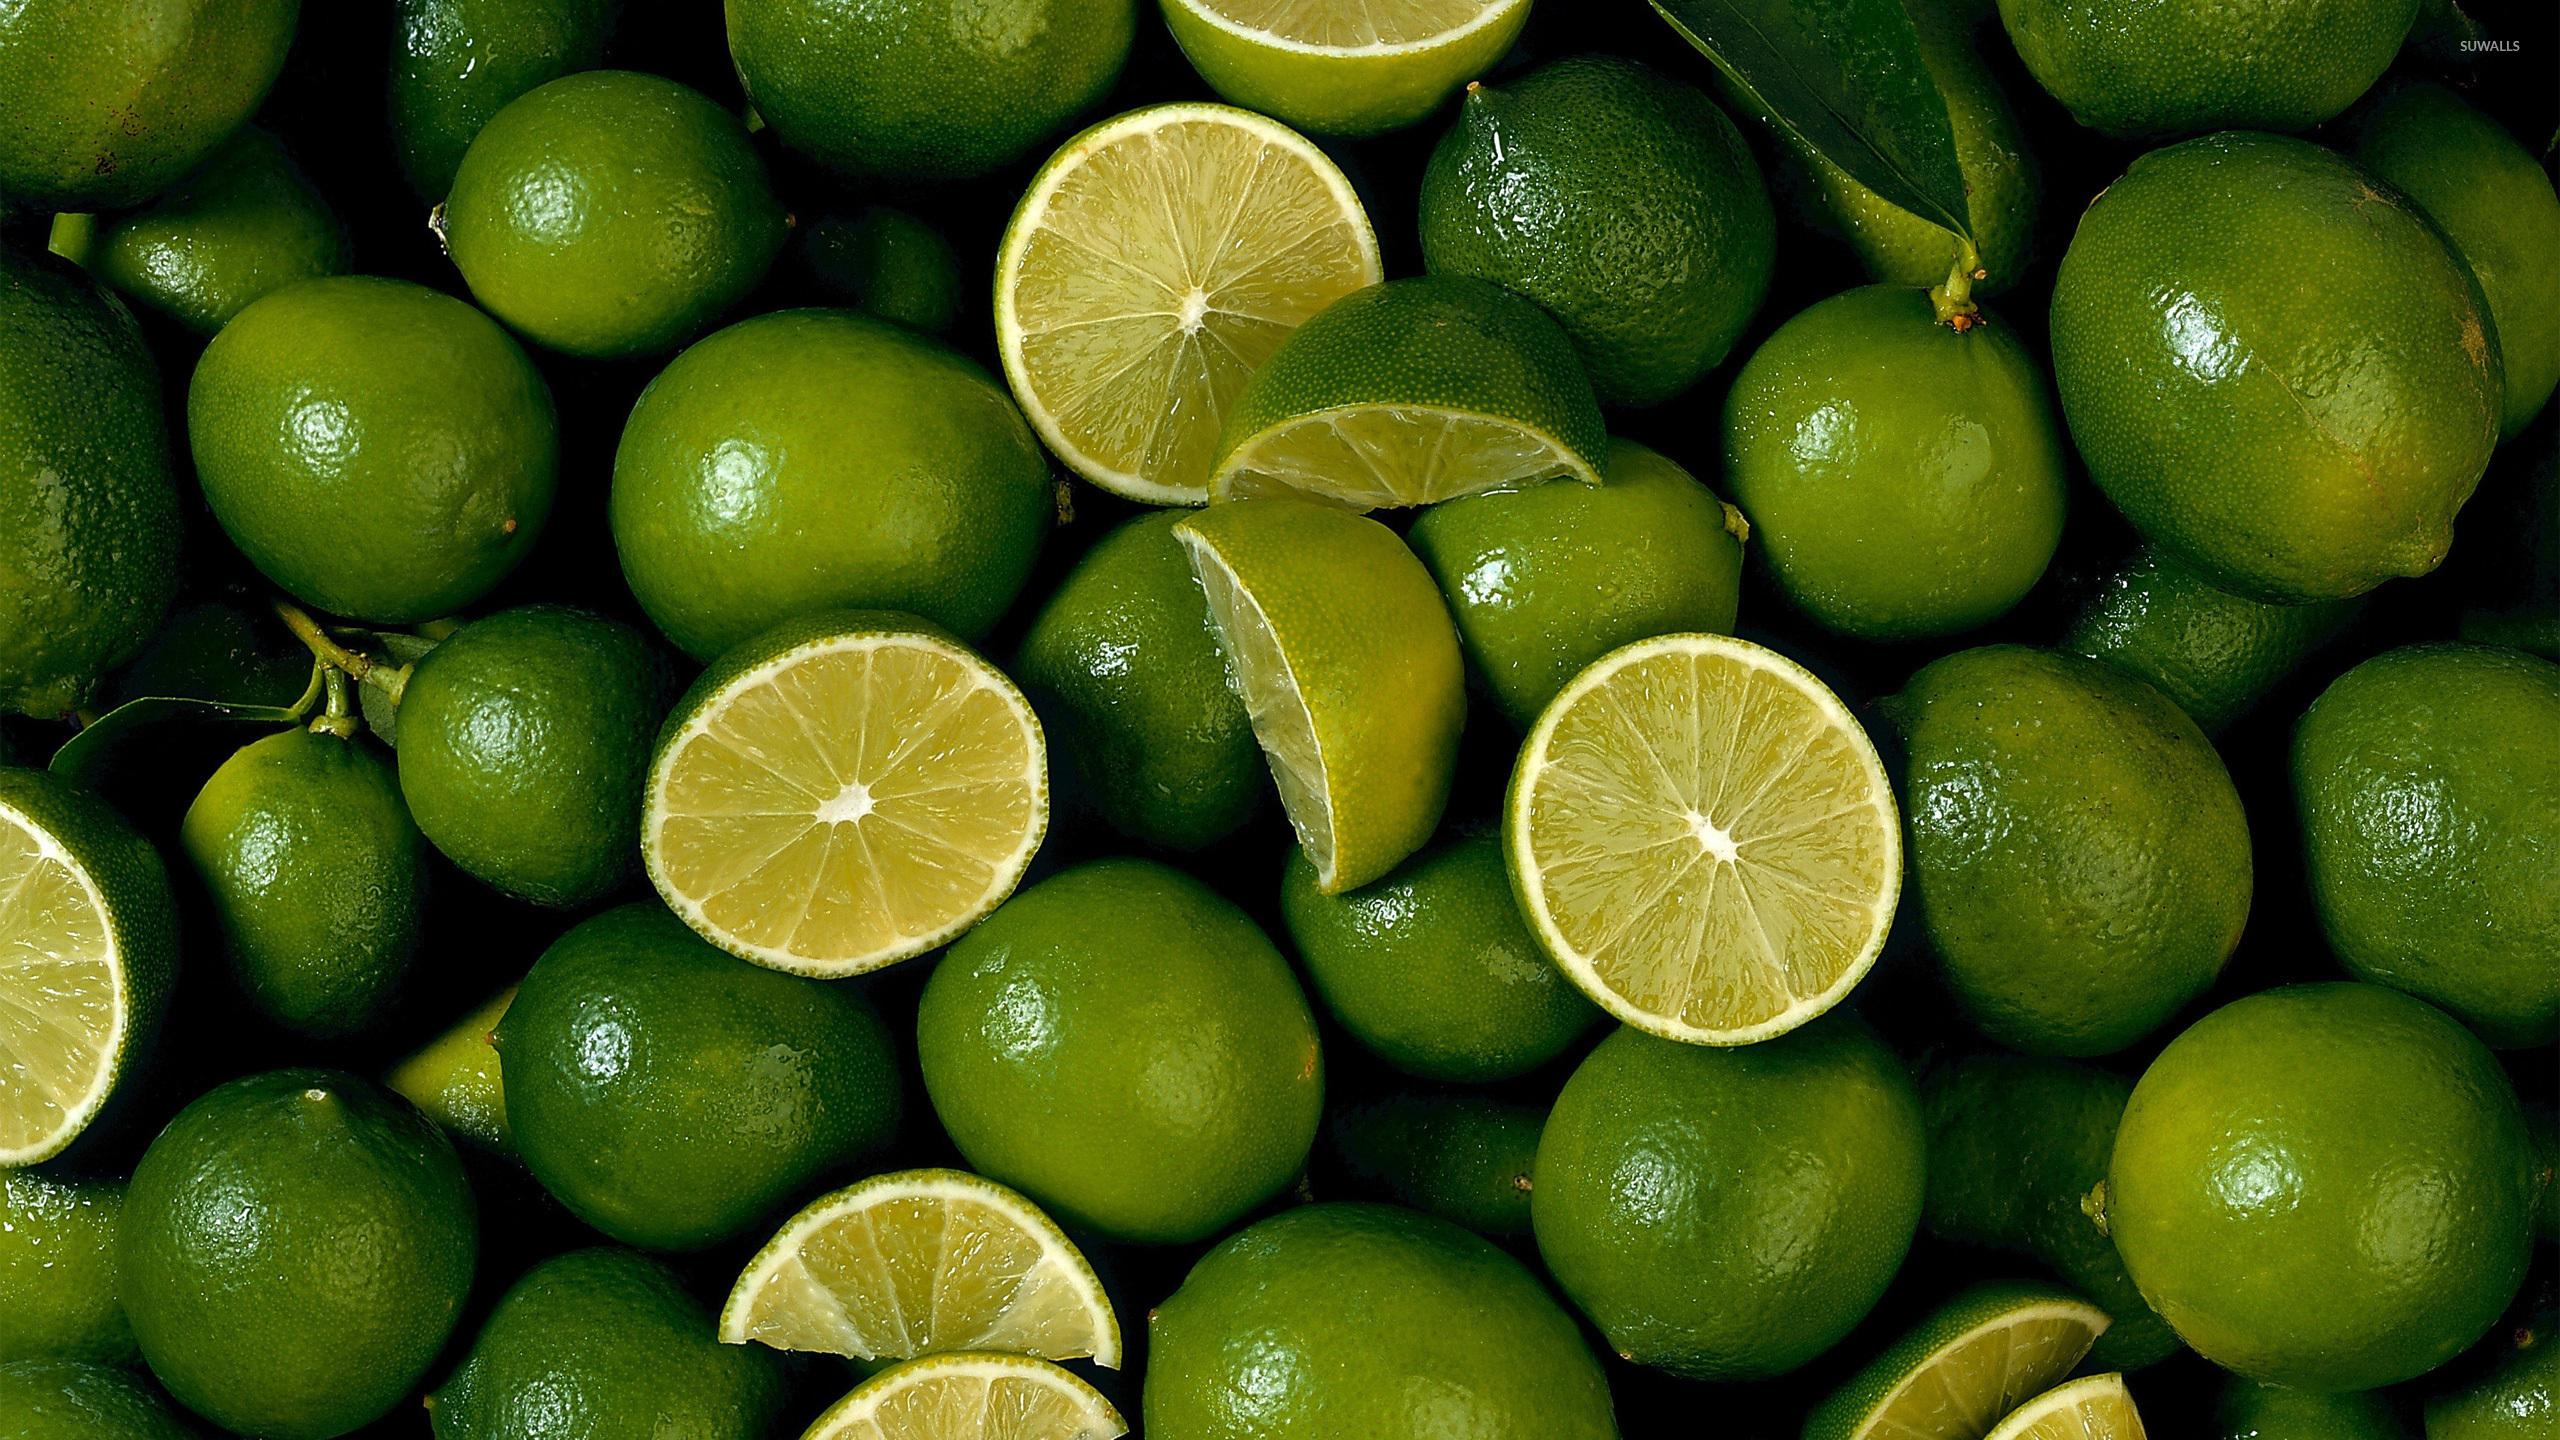 Free Fall Desktop Wallpaper Downloads Limes Wallpaper Photography Wallpapers 7017